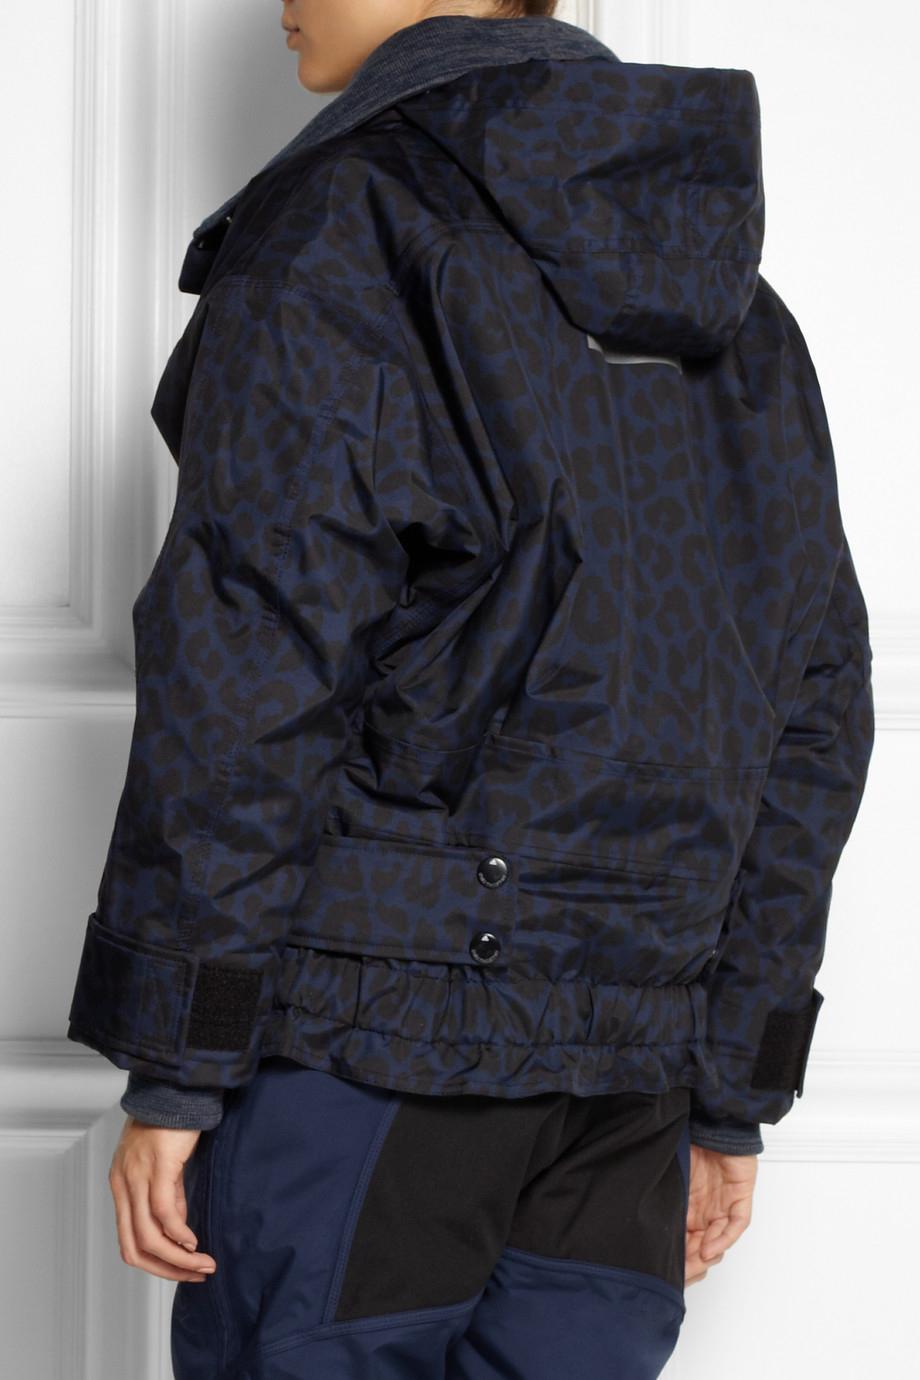 bd512eba99 adidas By Stella McCartney Ws Leopard-Print Climaproof® Storm Ski ...